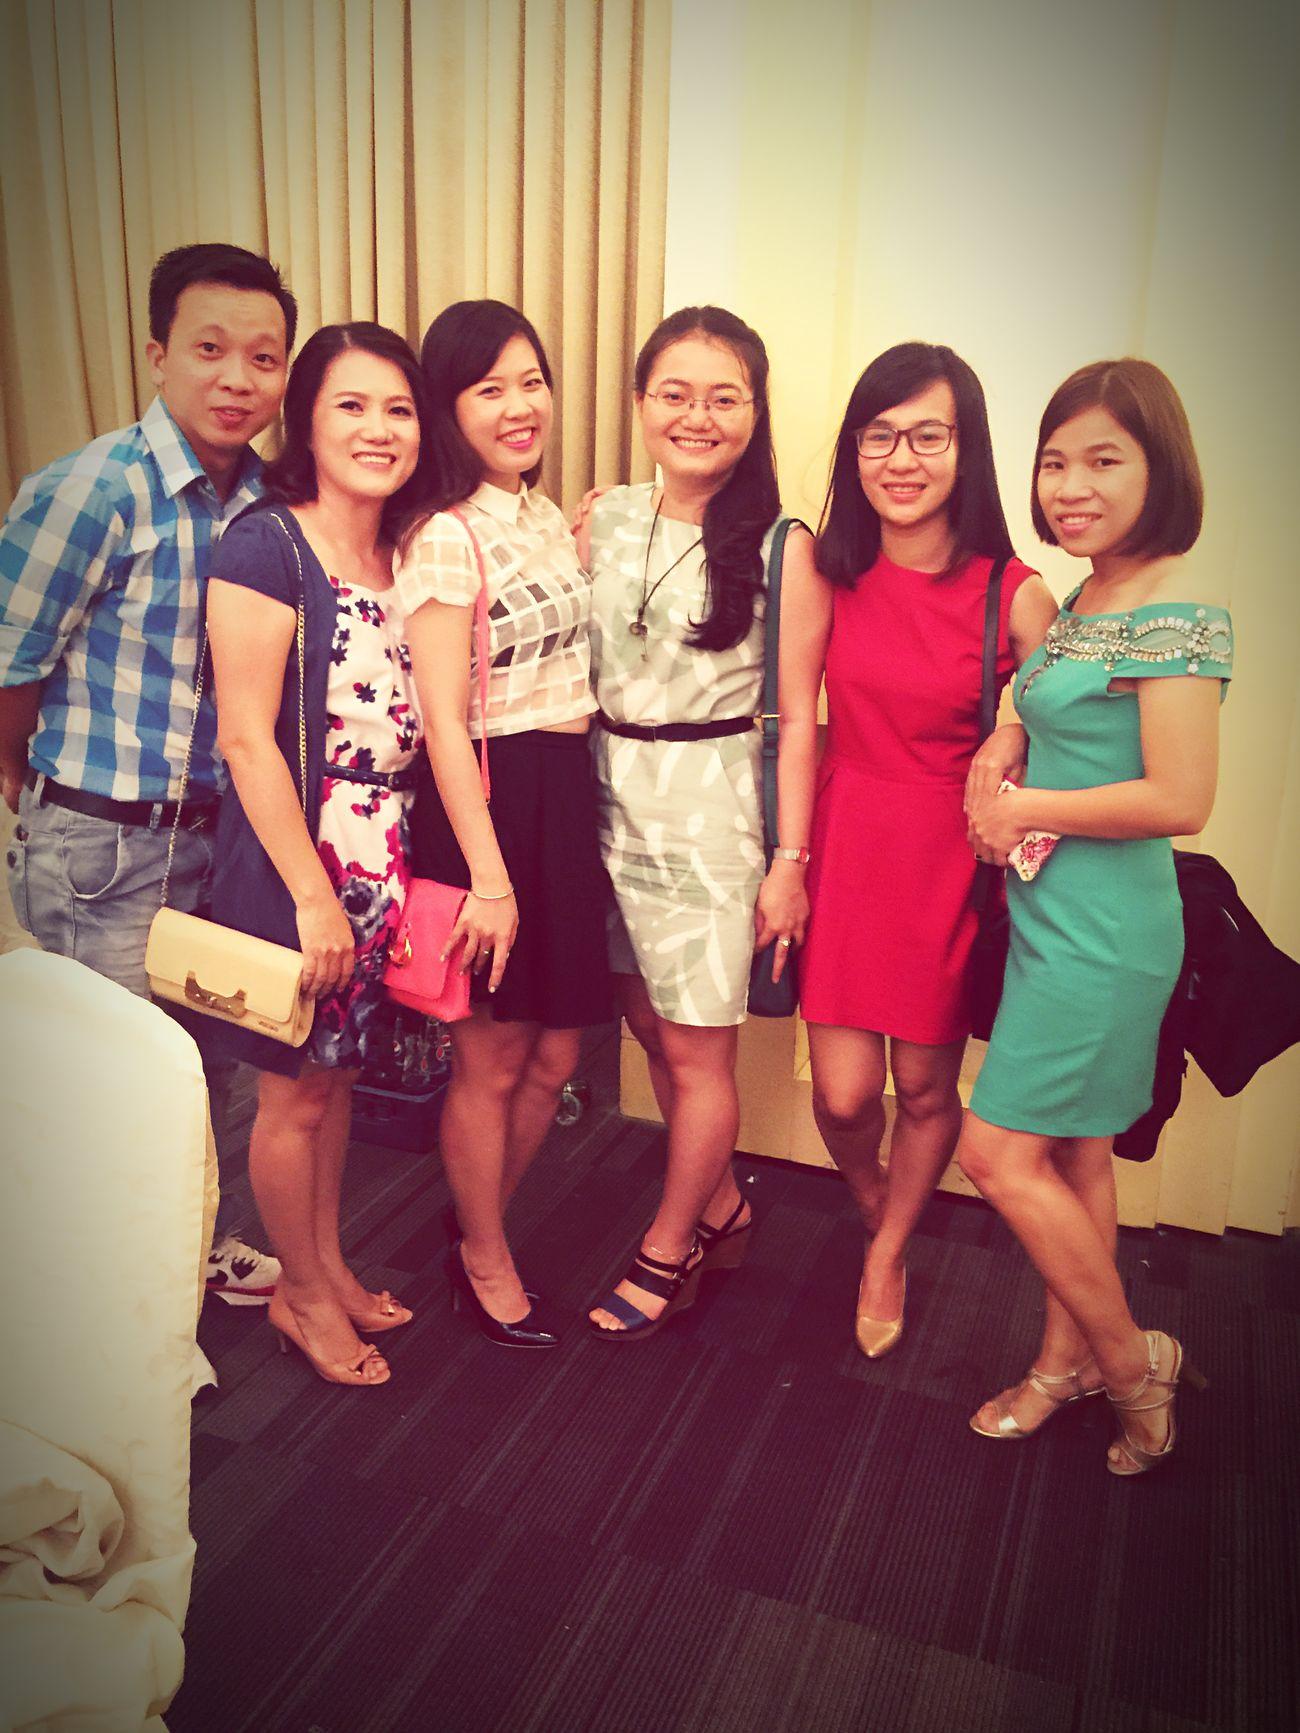 Wedding Party 😍